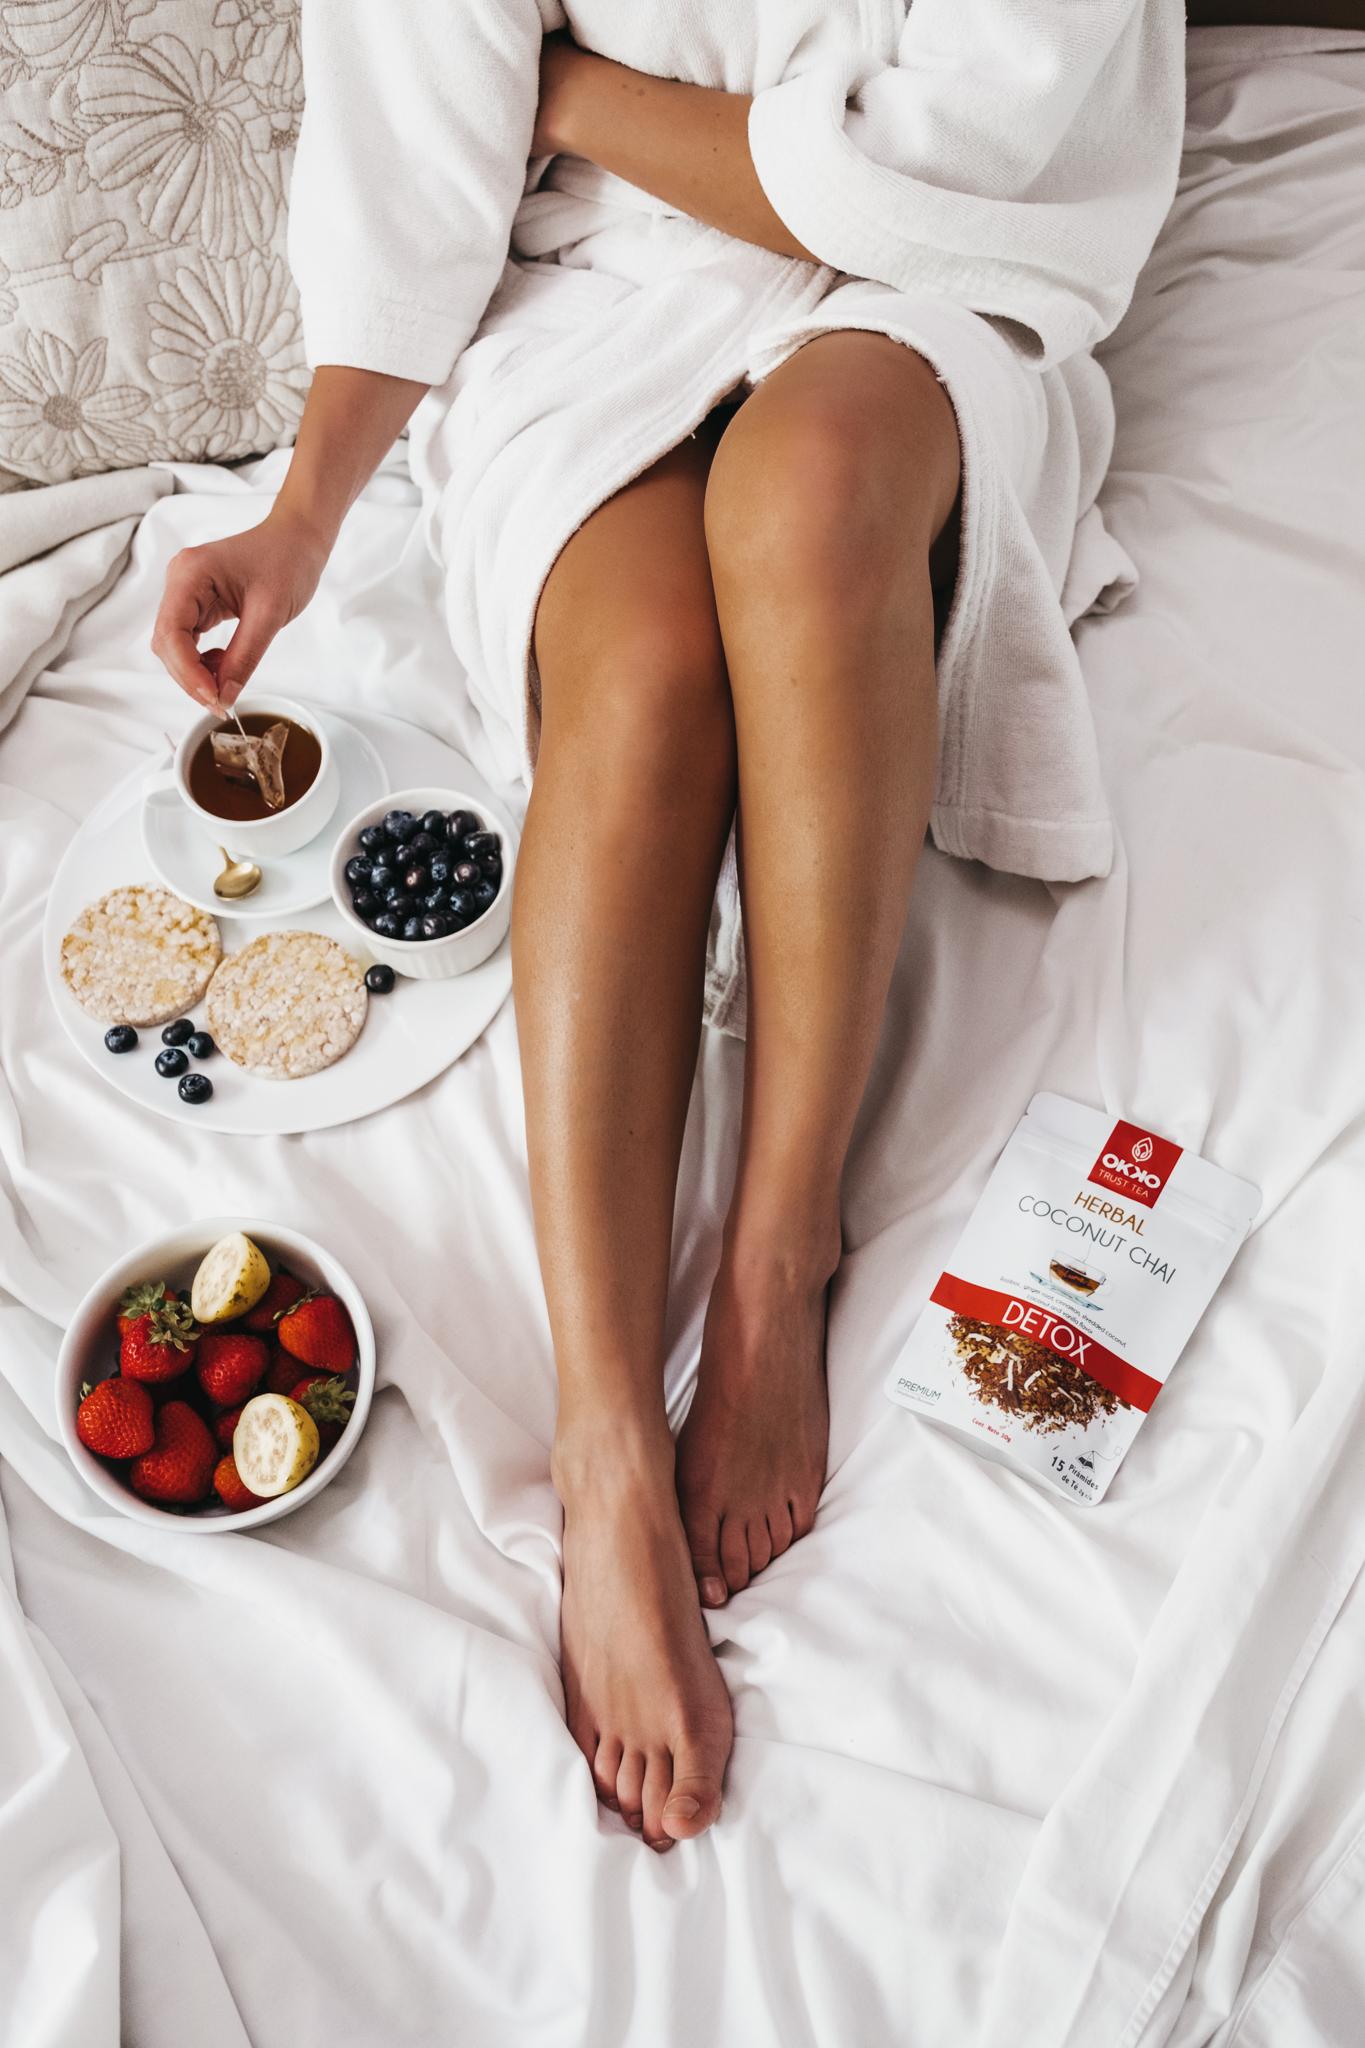 okko-superfoods-product-photography-2